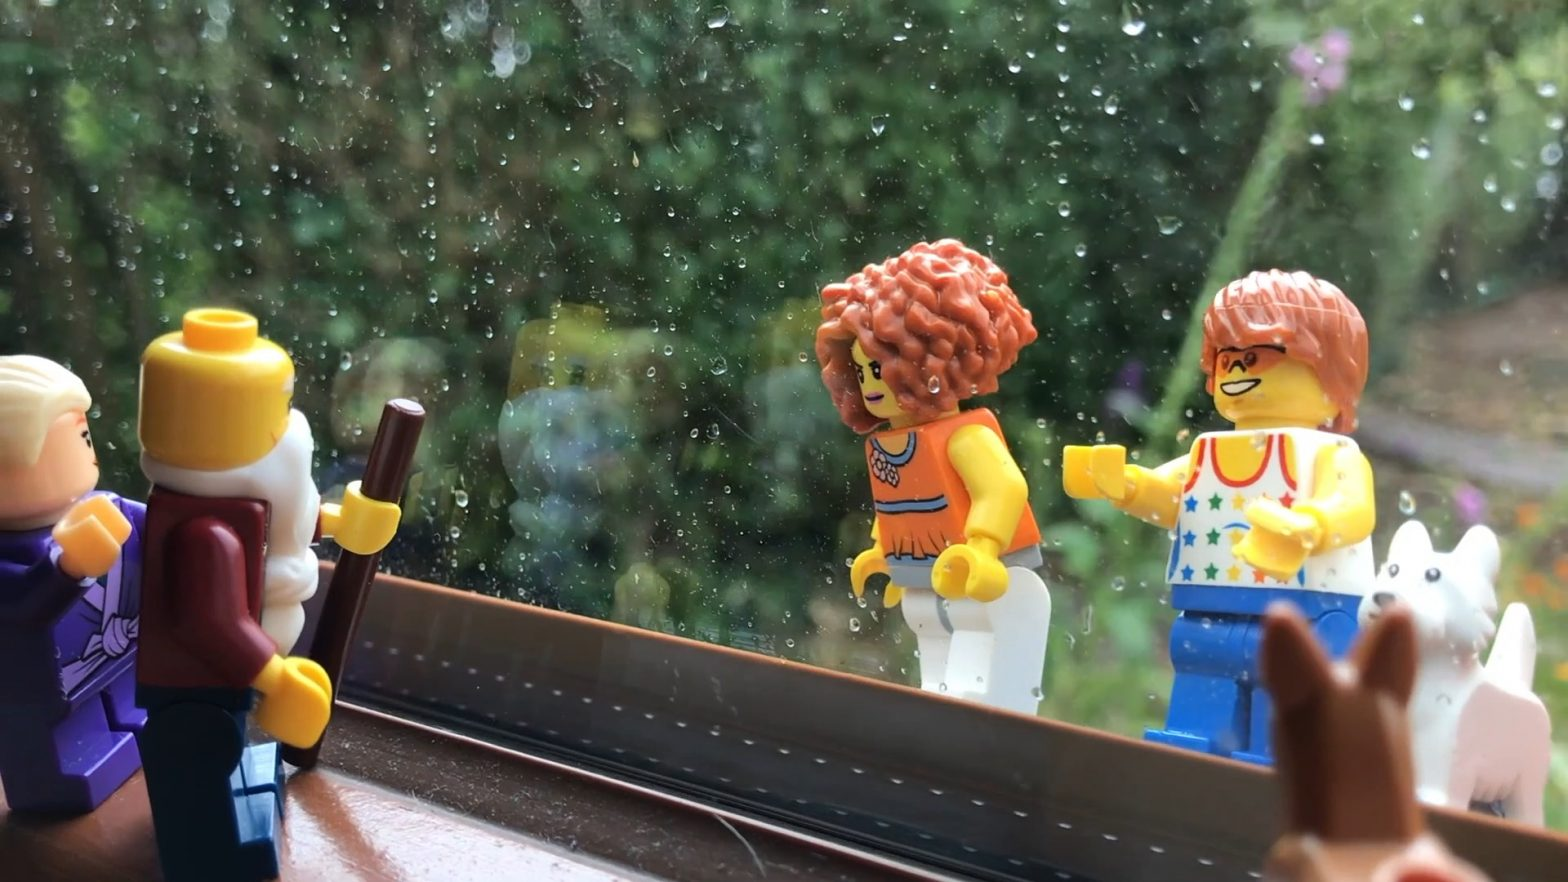 Lego scene set between a window pane.